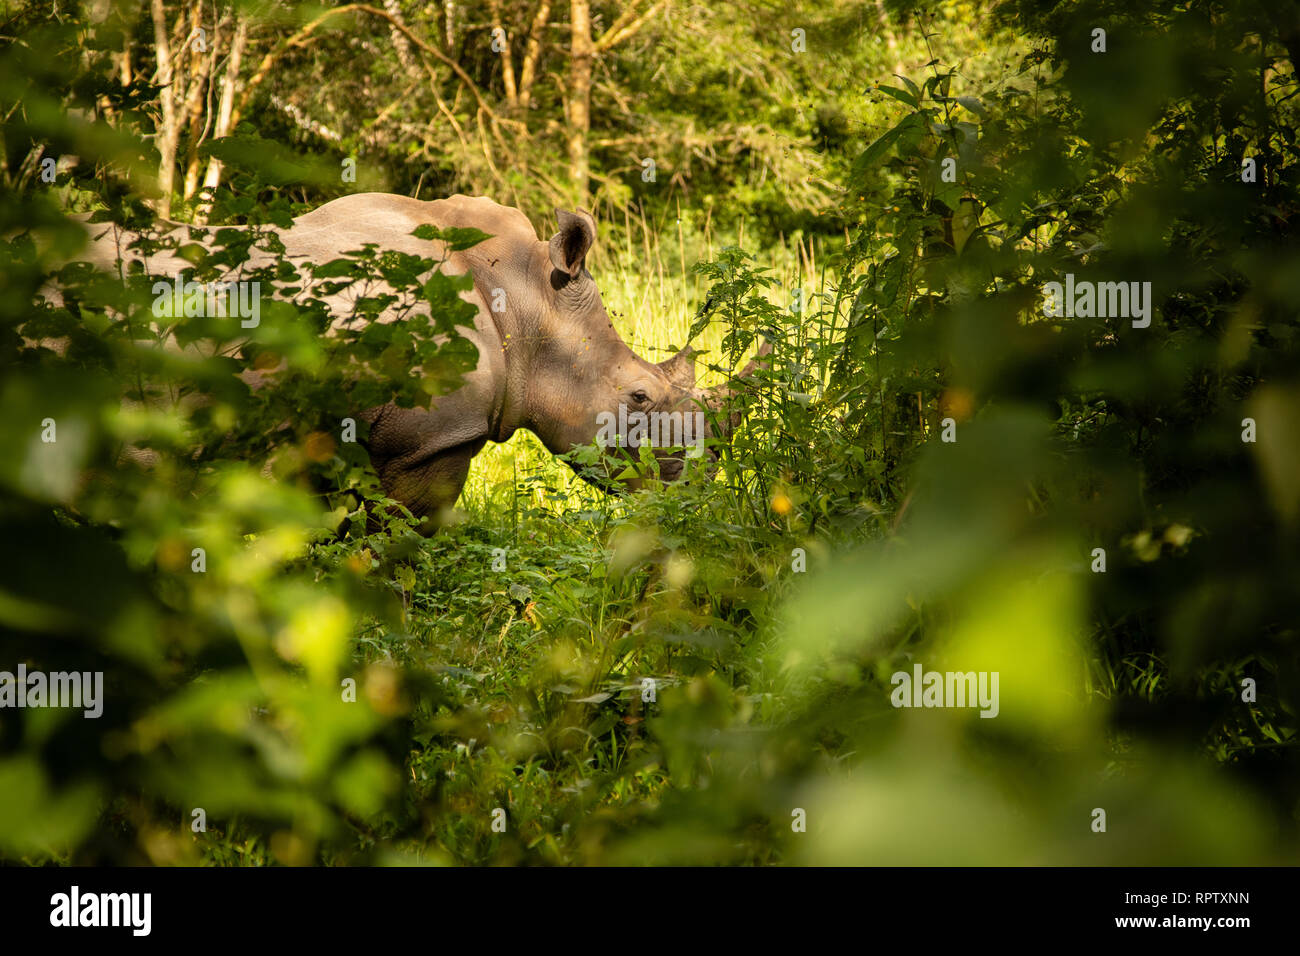 A White Rhinoceros (Ceratotherium simum) grazing in amongst the bushes at Ziwa Rhino Sanctuary in Uganda - Stock Photo